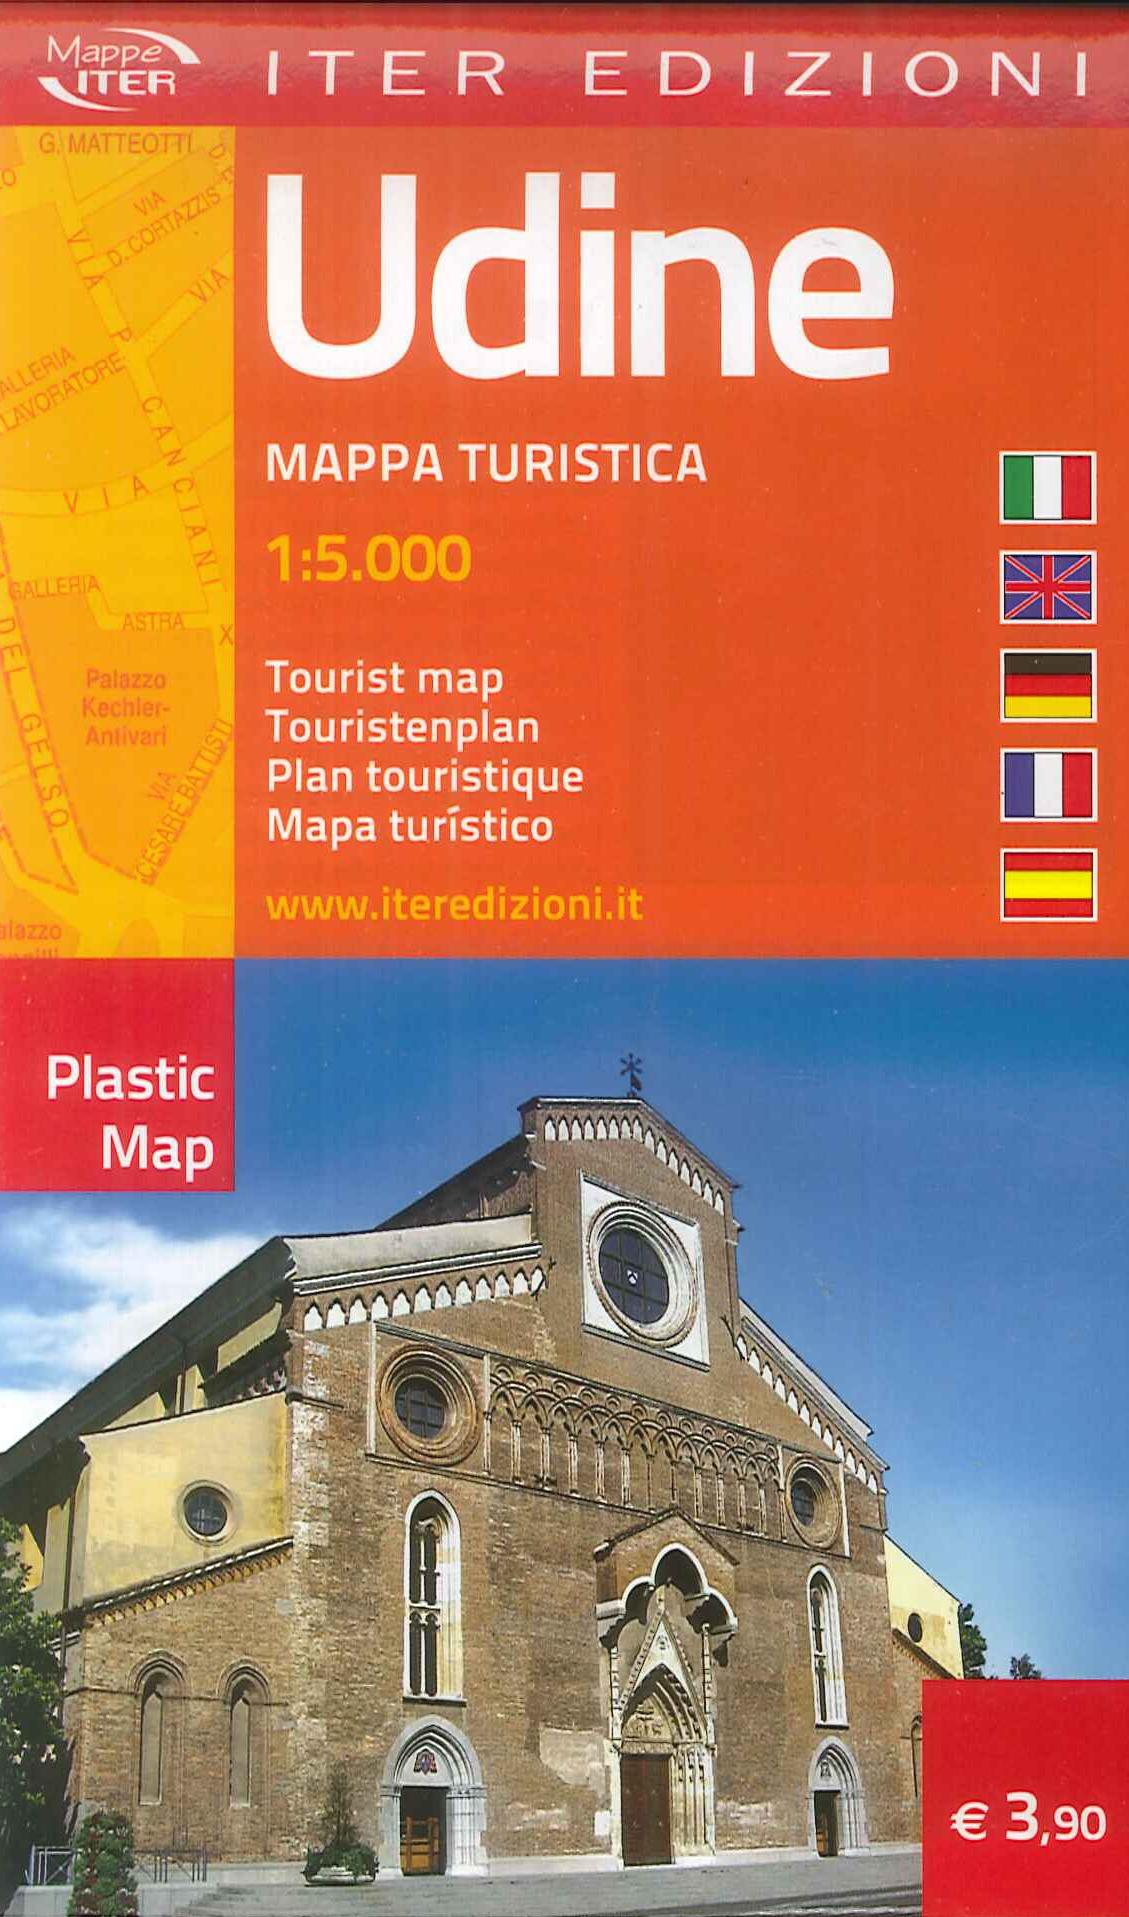 Udine. Mappa turistica 1:5.000. Ediz. multilingue.